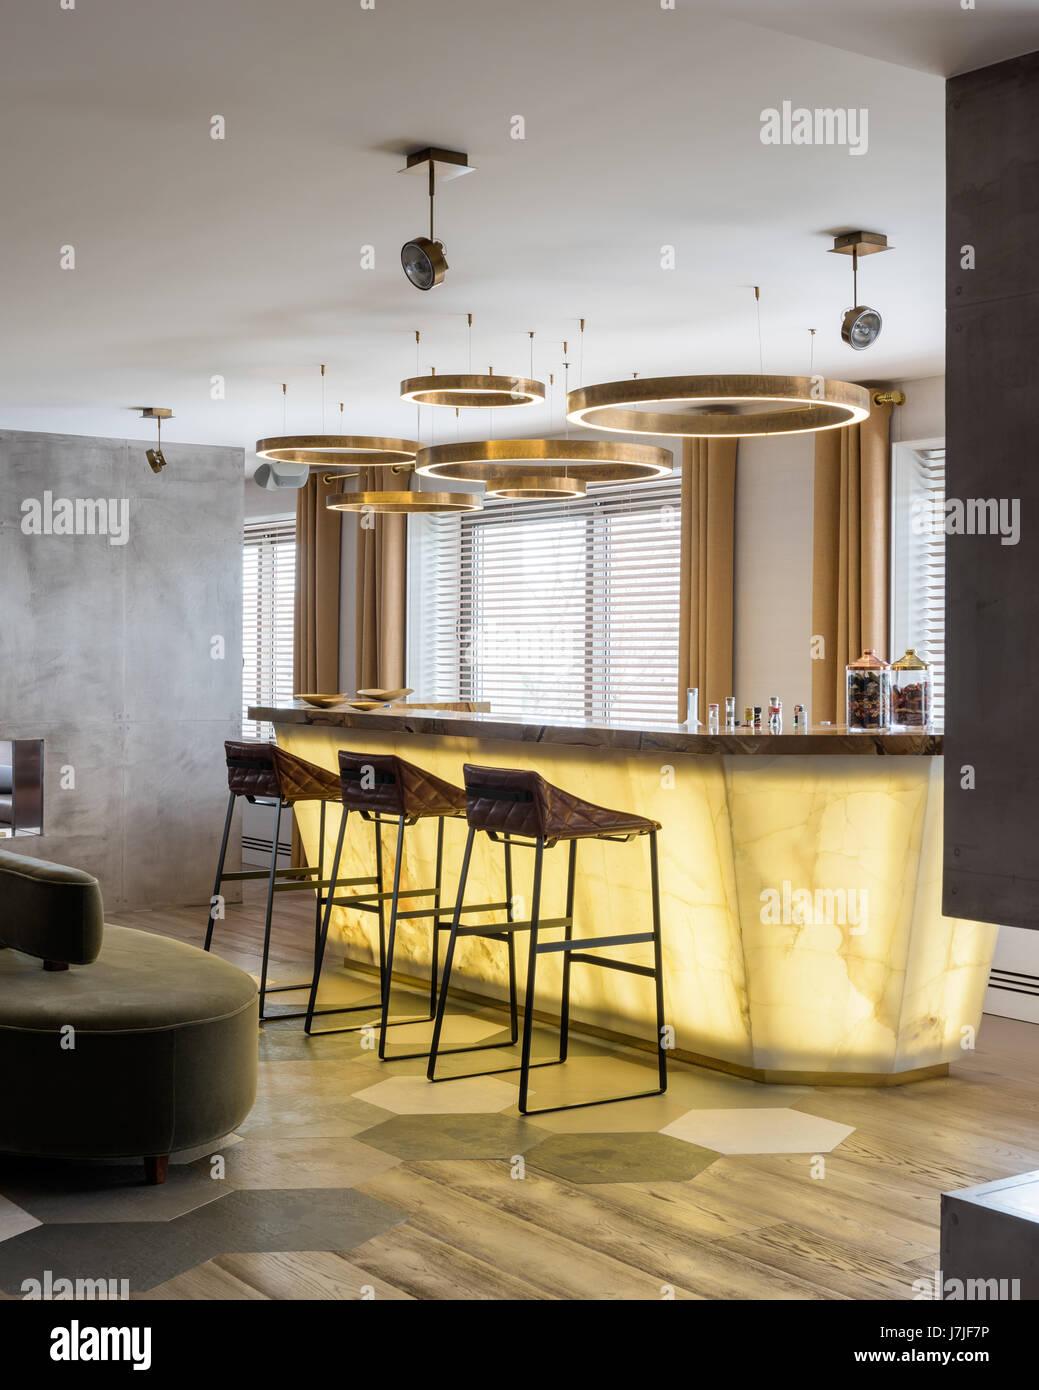 Circular lighting above lit bar area in Istanbul apartment - Stock Image